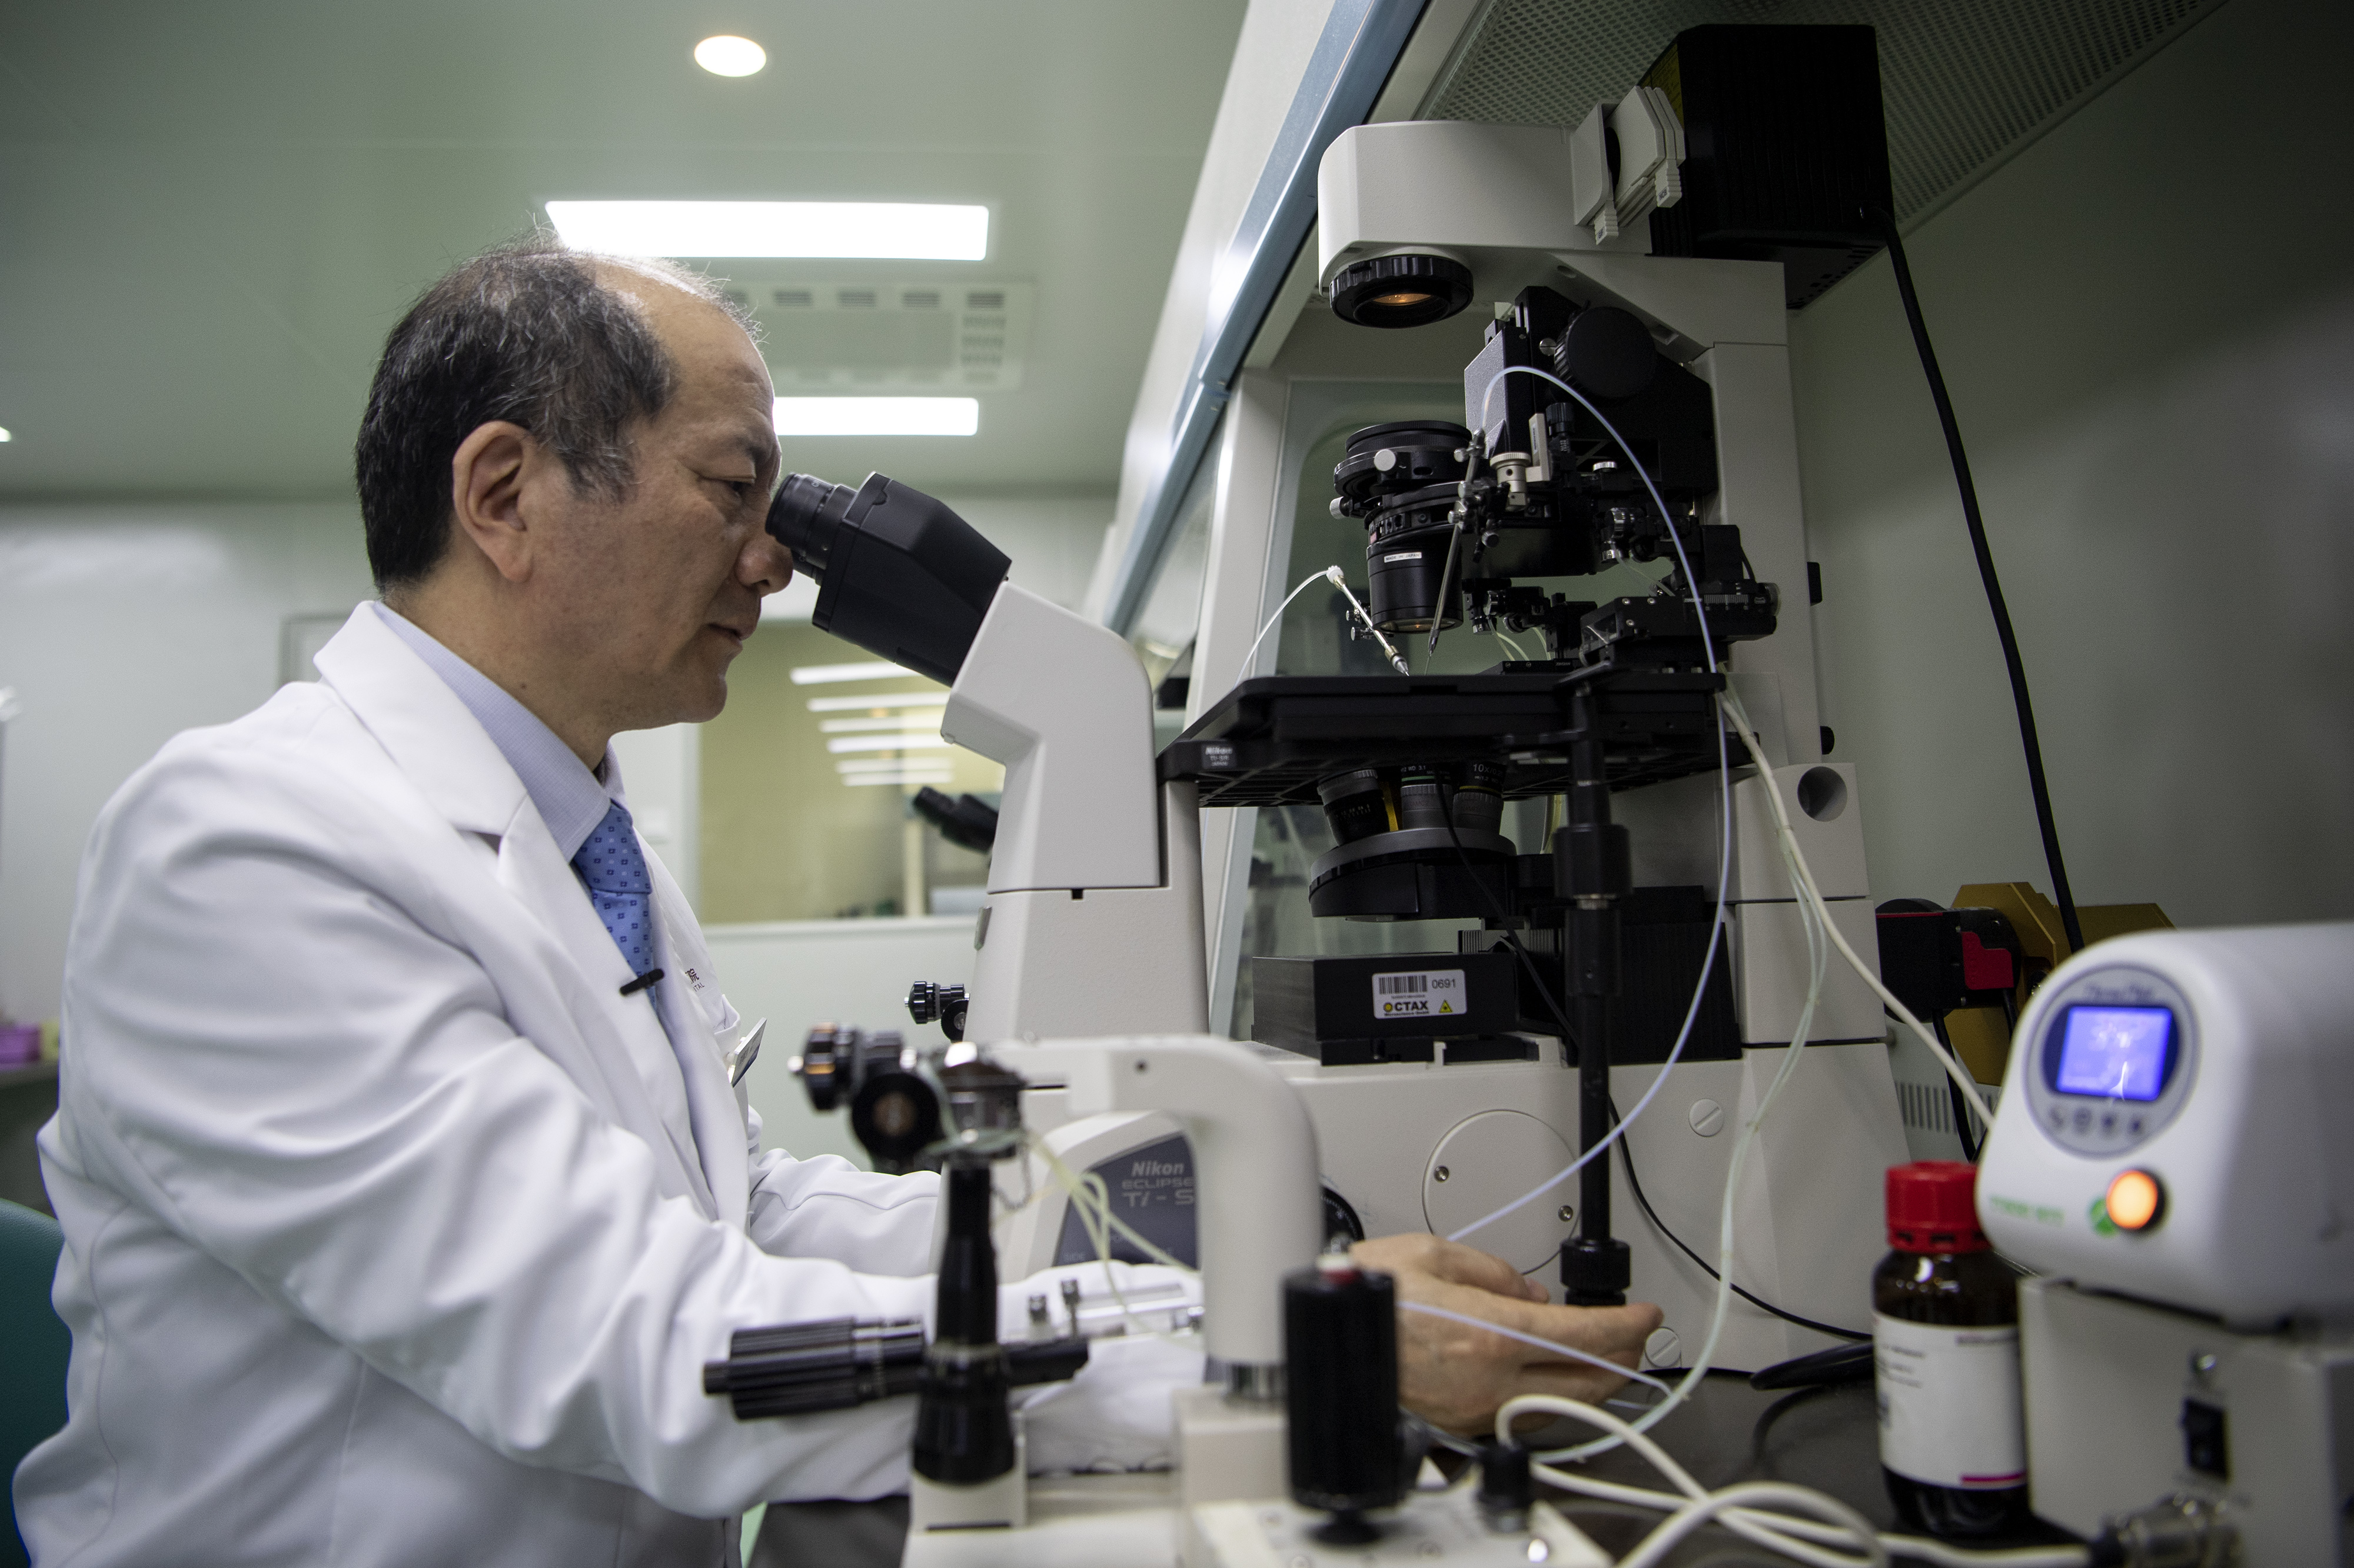 El doctor Liu Jiaen, director de un hospital de fertilidad, mira una muestra de esperma a través de un microscopio en el hospital de Beijing.